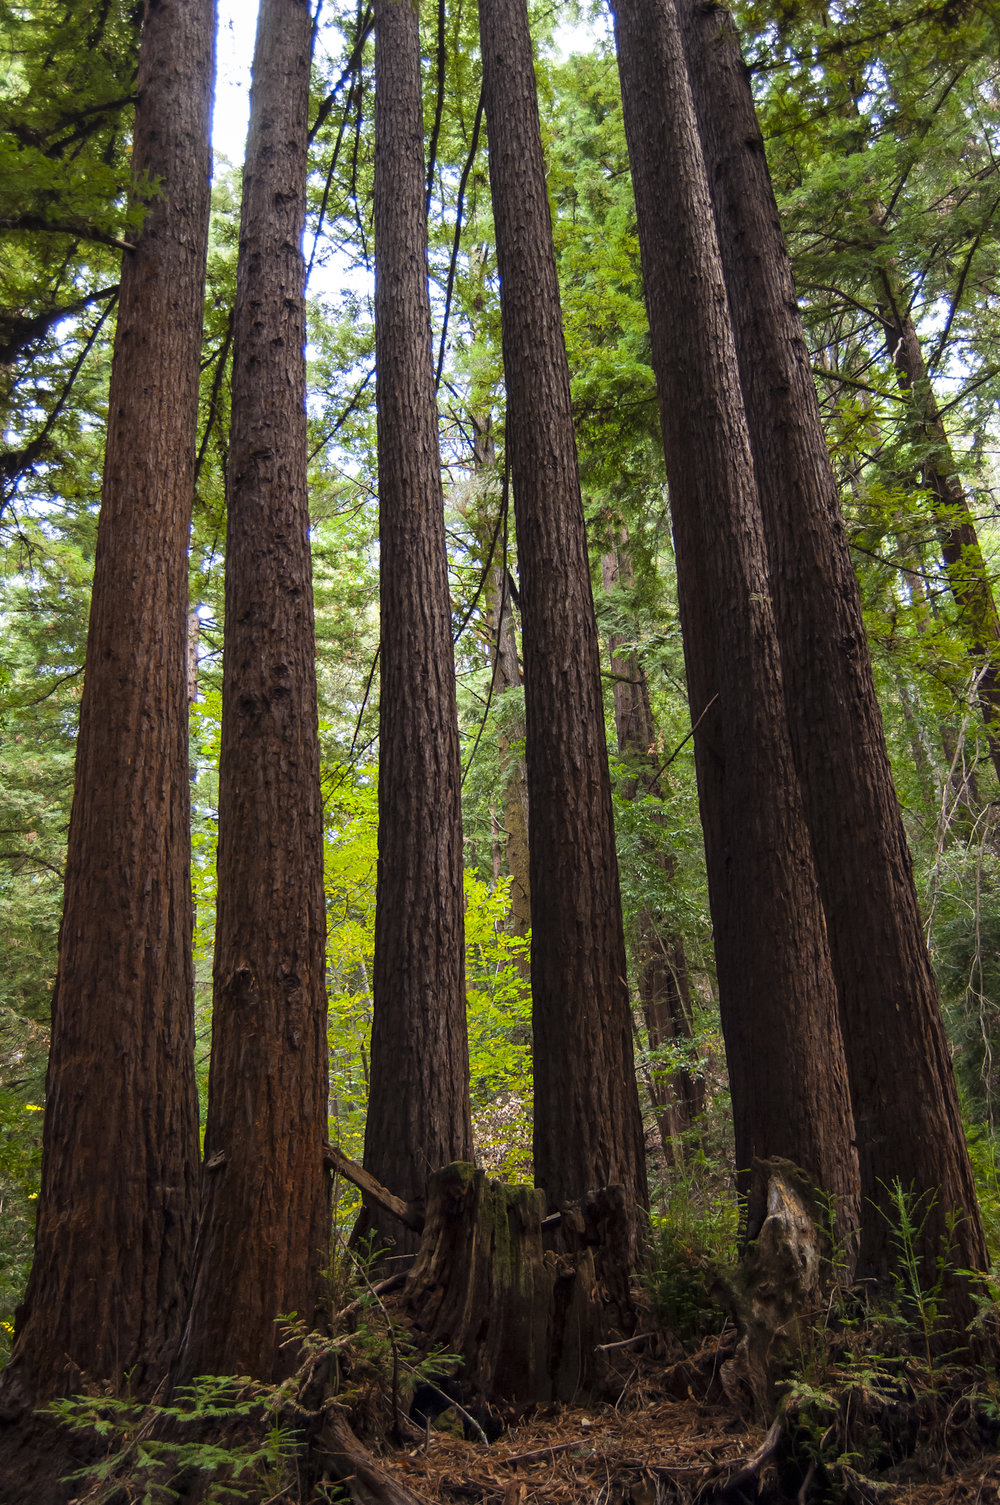 Redwoods on the vineyard land.